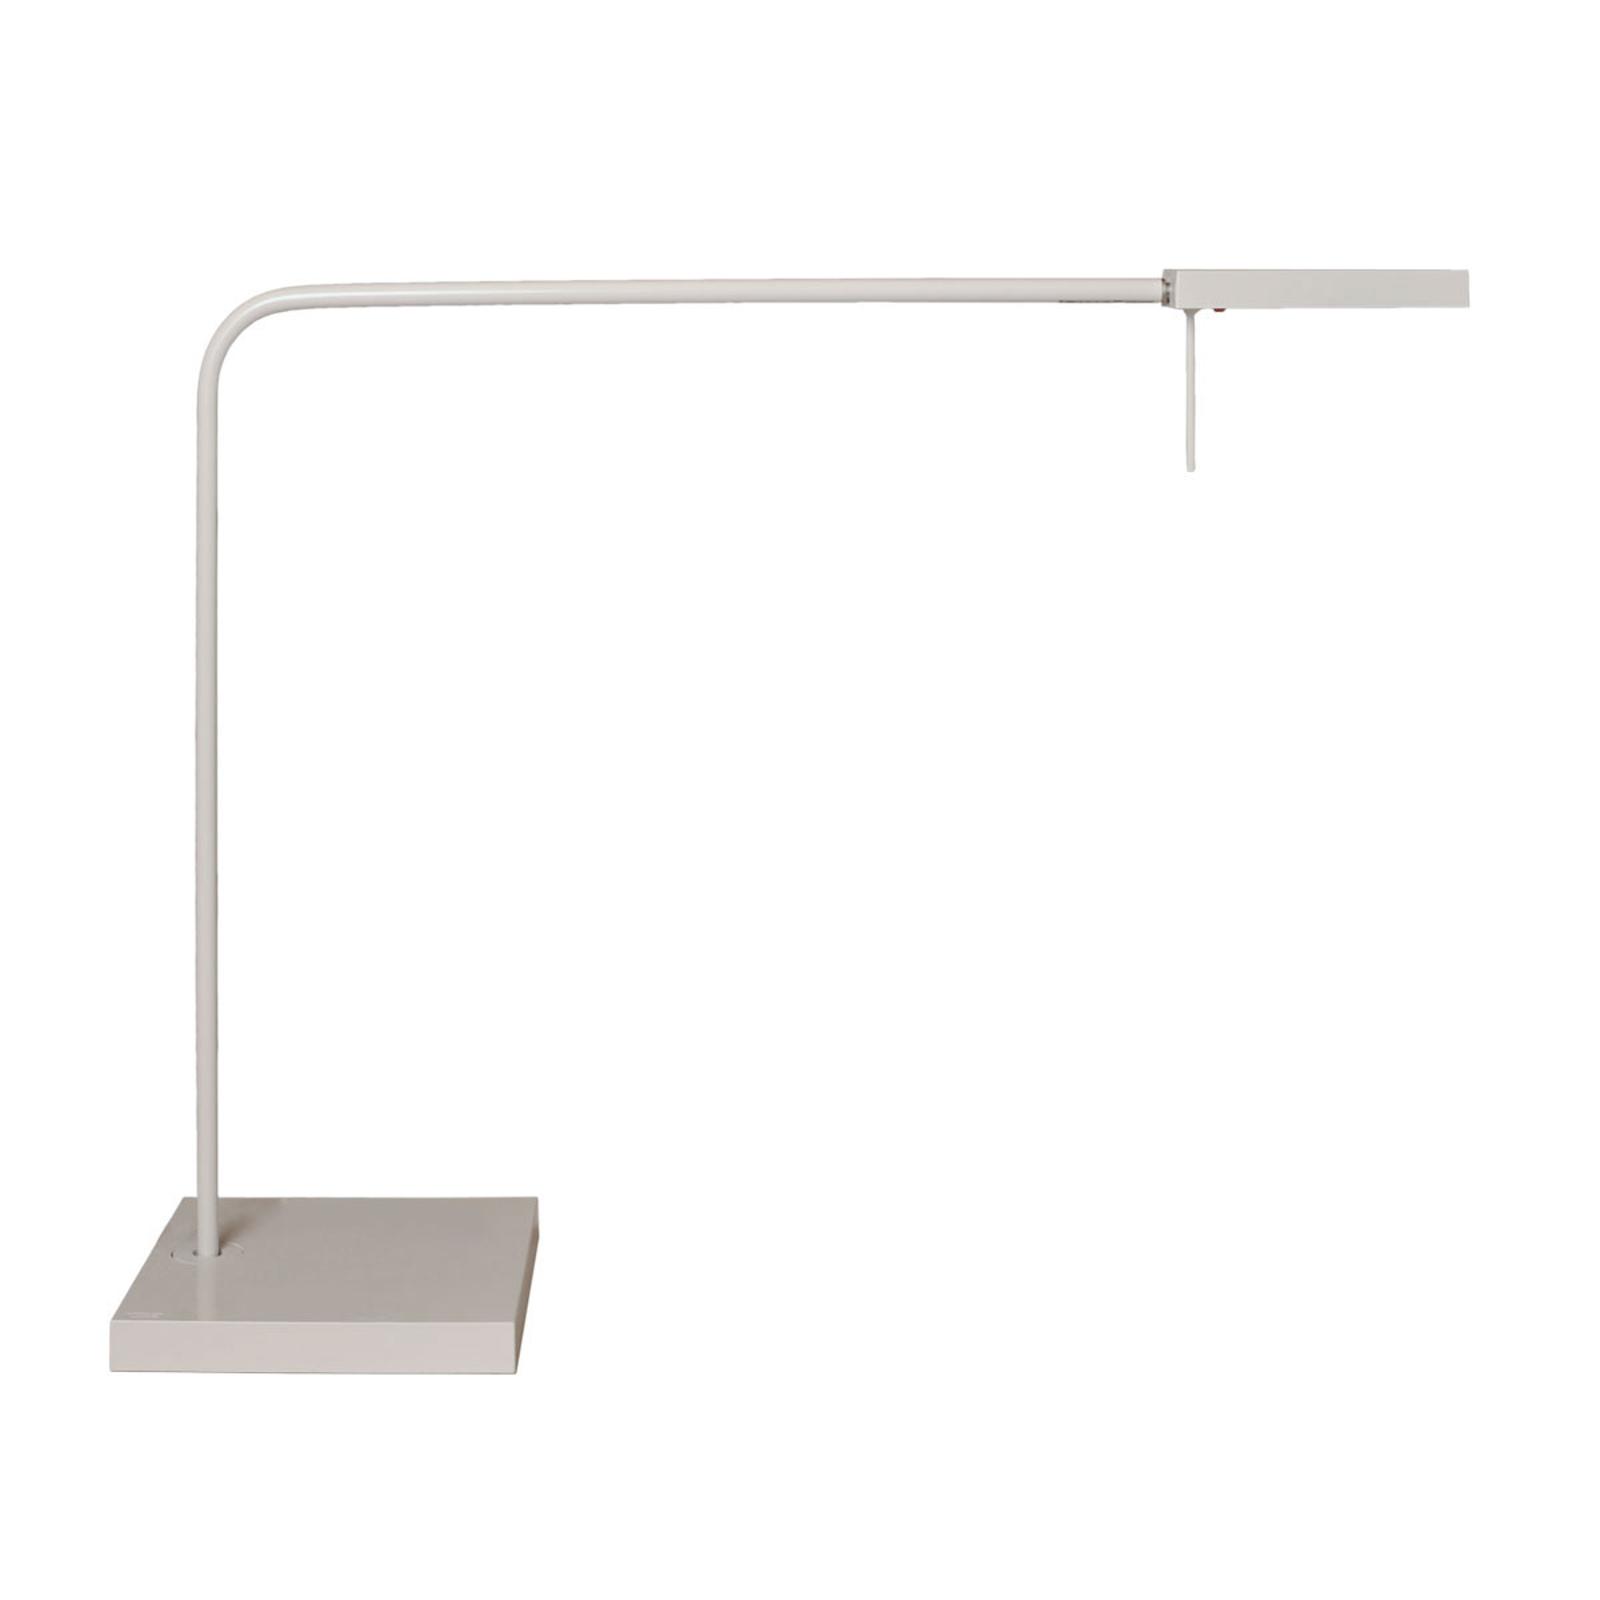 Lampe de bureau LED Ninety avec pied en blanc